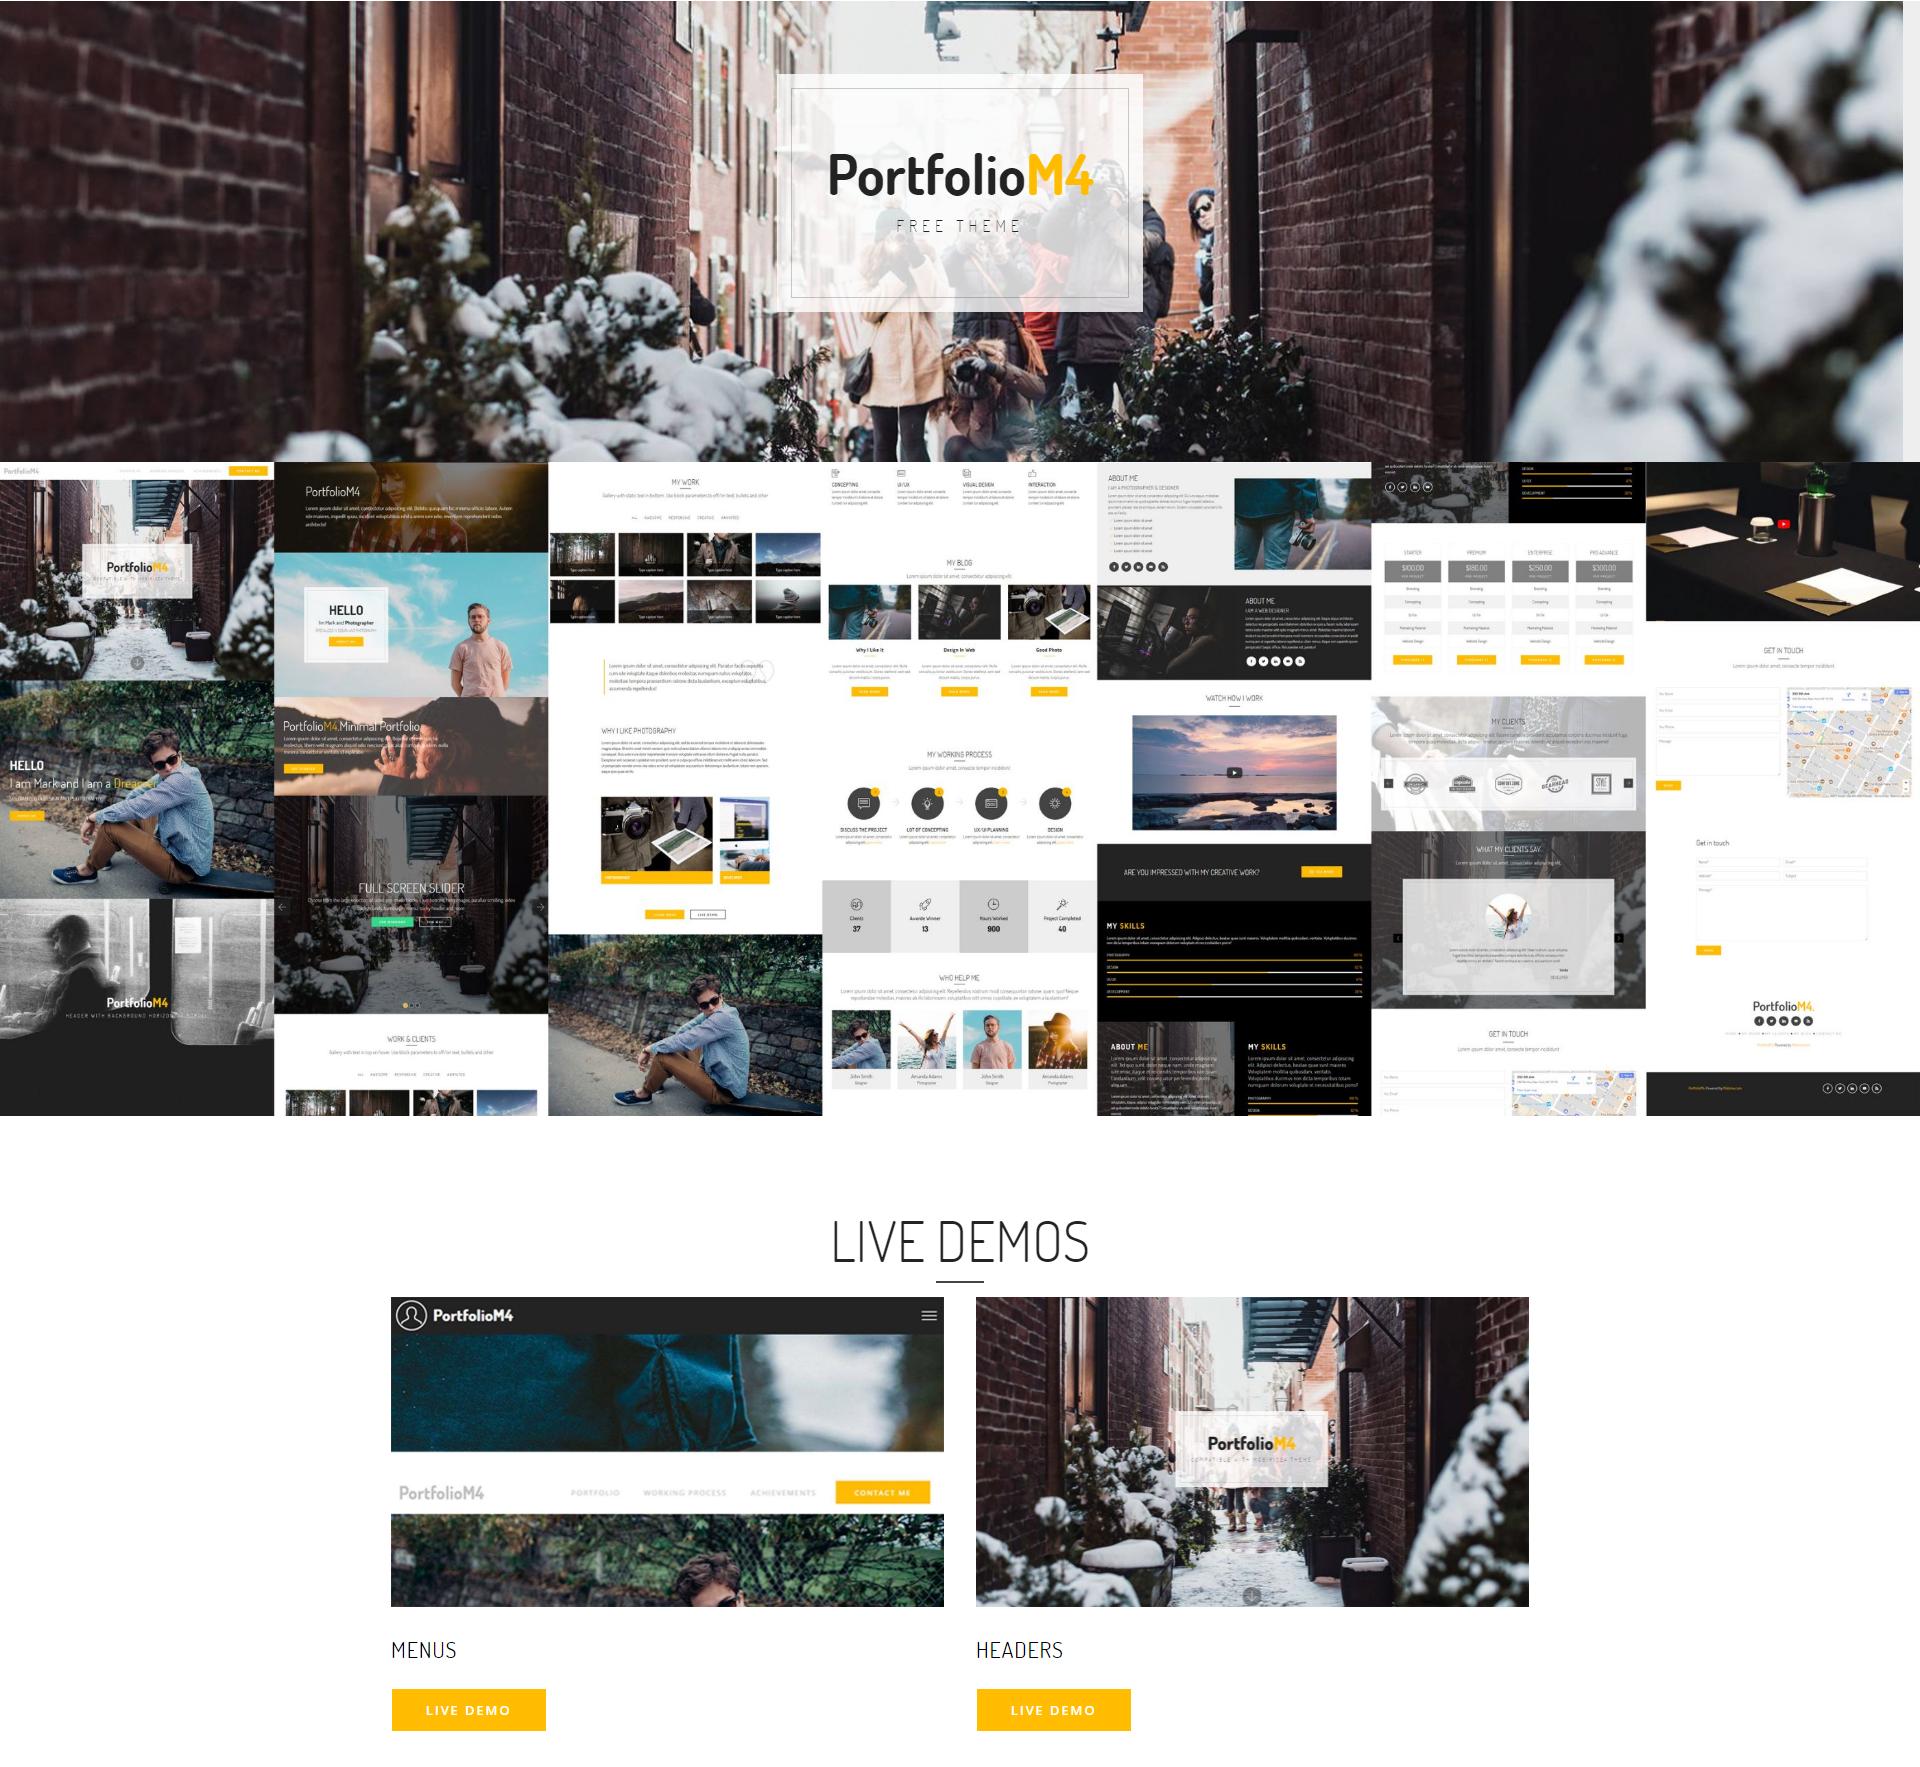 Free Bootstrap PortfolioM4 Templates